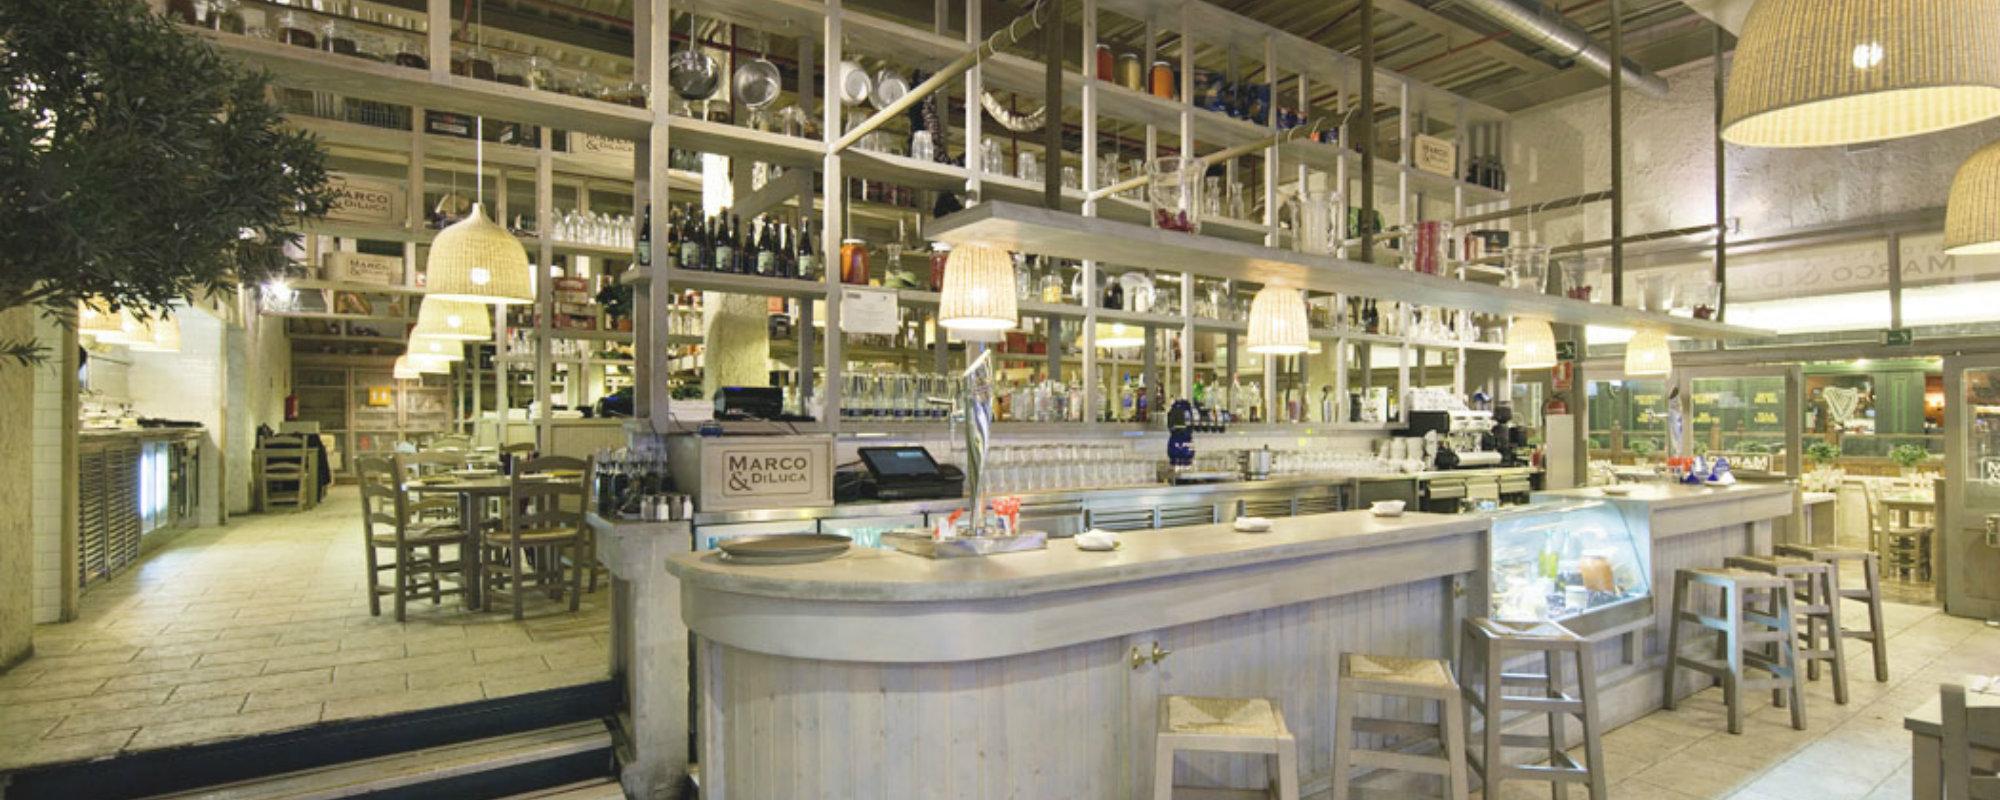 Ruiz Velazquez: Un estudio de Arquitectura lujuosa y perfecto en España ruiz velazquez Ruiz Velazquez: Un estudio de Arquitectura lujuosa y perfecto en España Featured 7